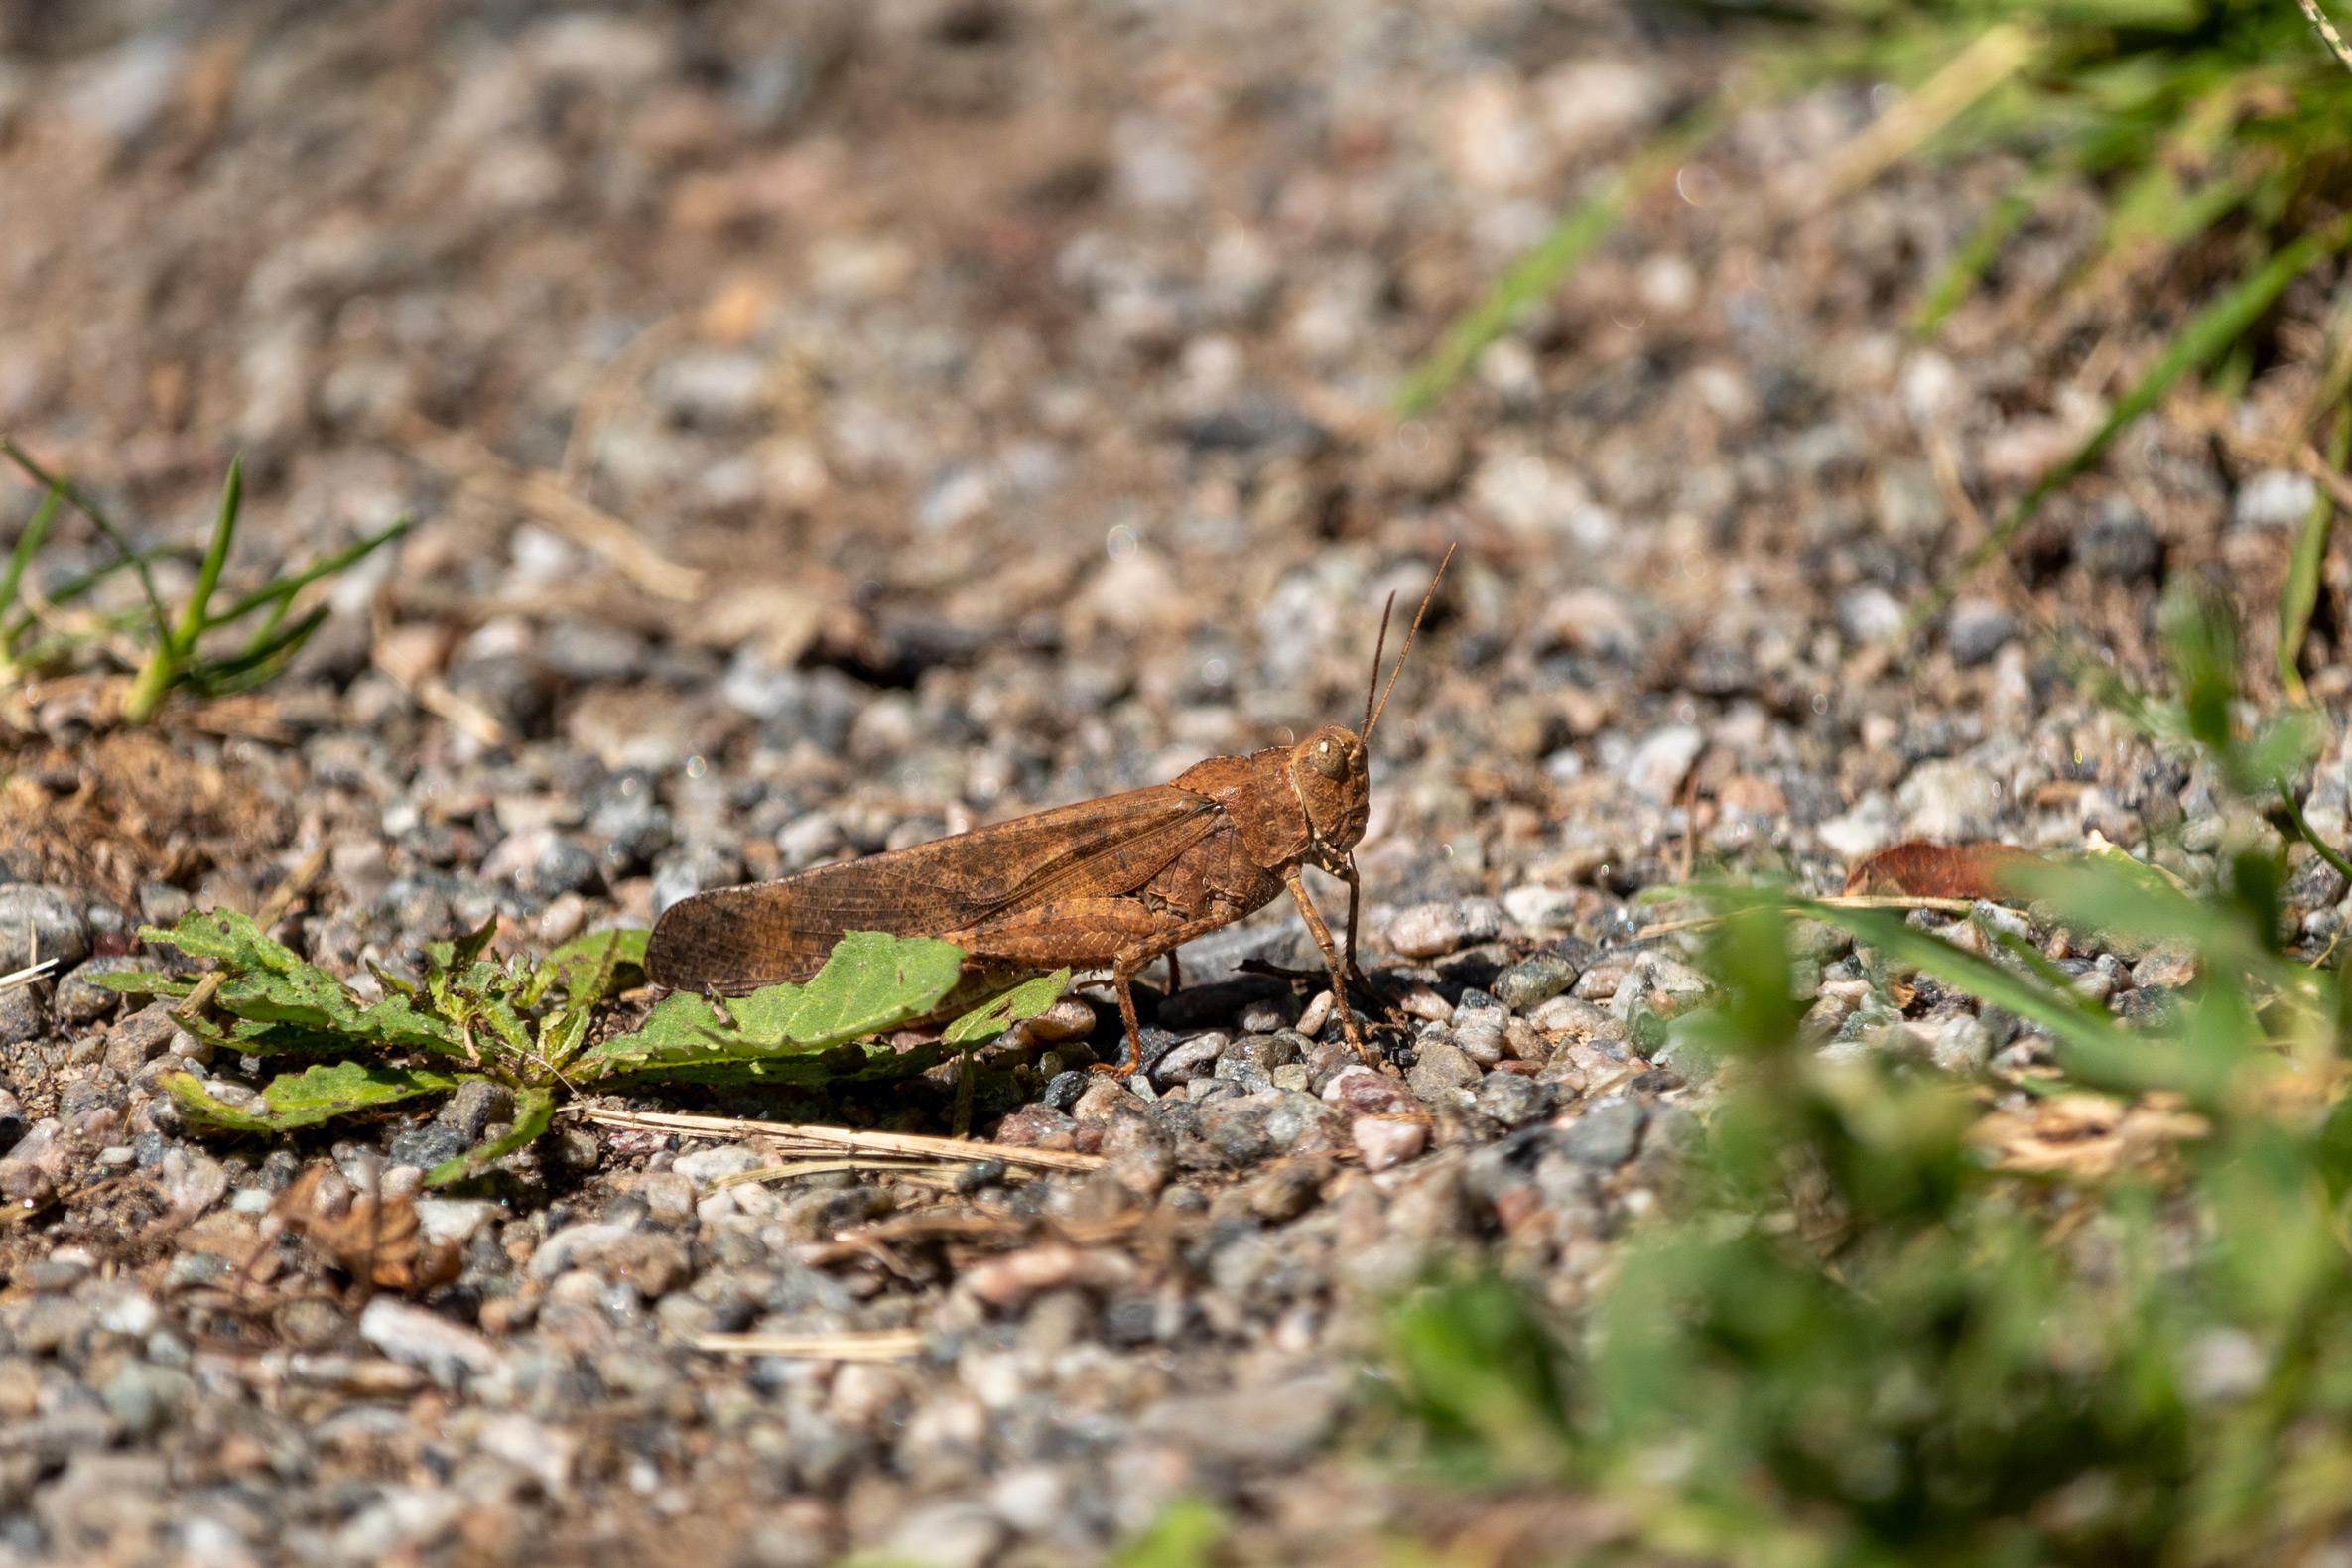 Brown grasshopper standing on gravel beside some small green plants